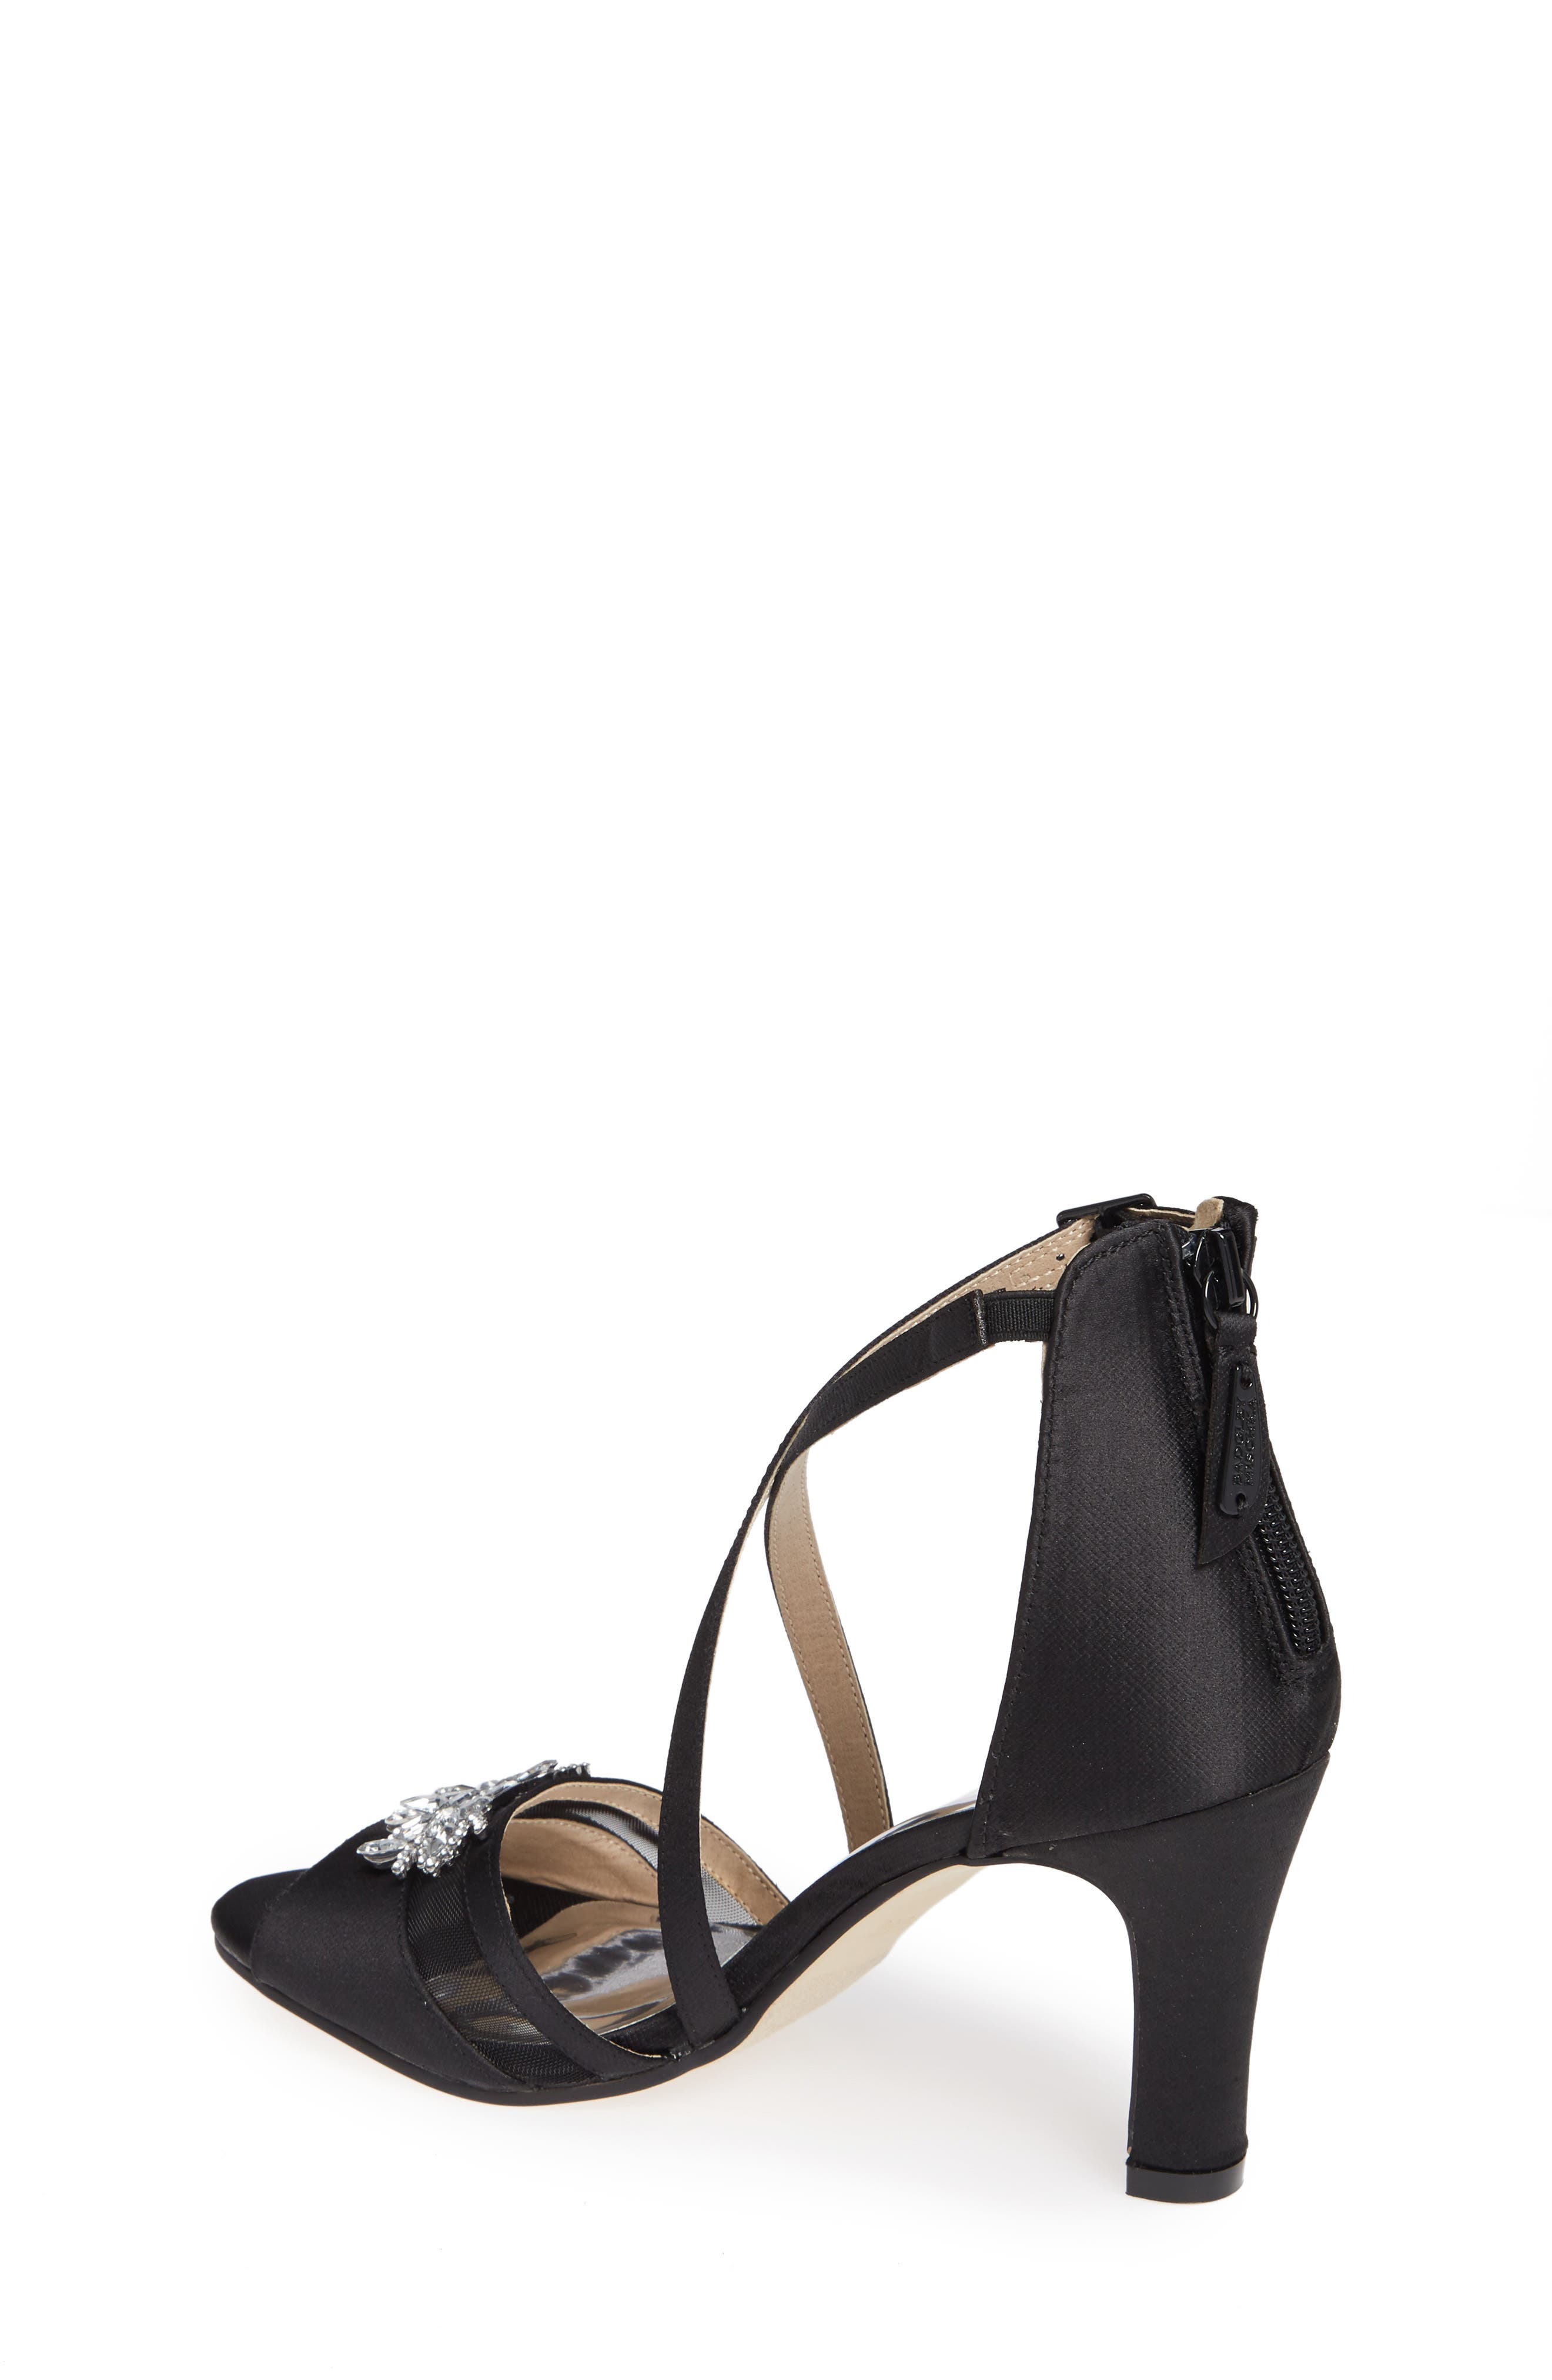 Badgley Mischka Kandall Hannah Embellished Cross Strap Sandal,                             Alternate thumbnail 2, color,                             BLACK SATIN